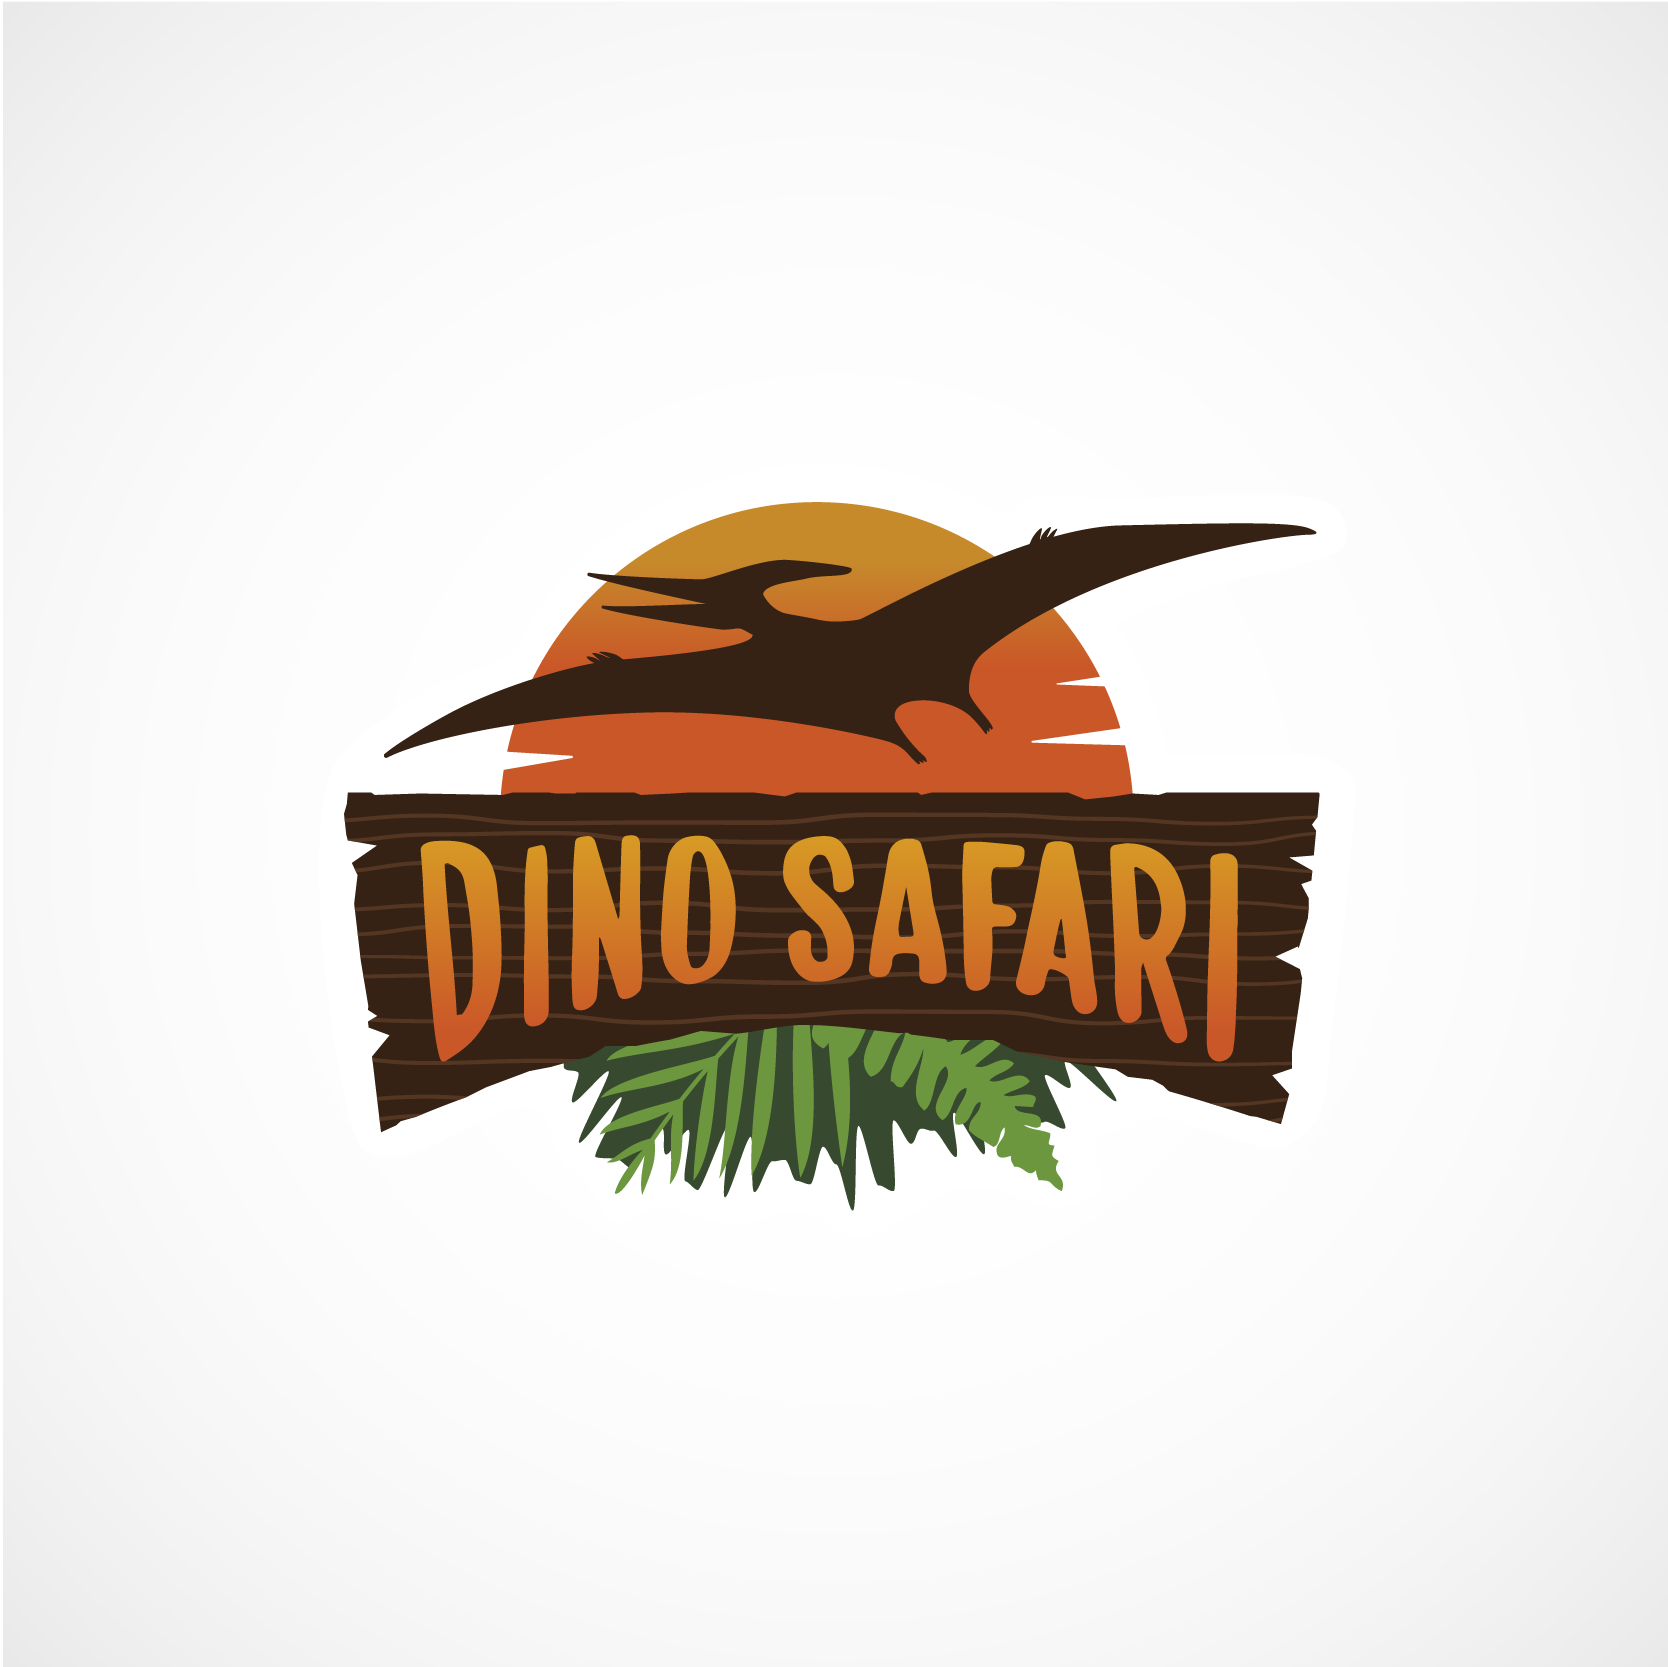 dino-safari-logo.png